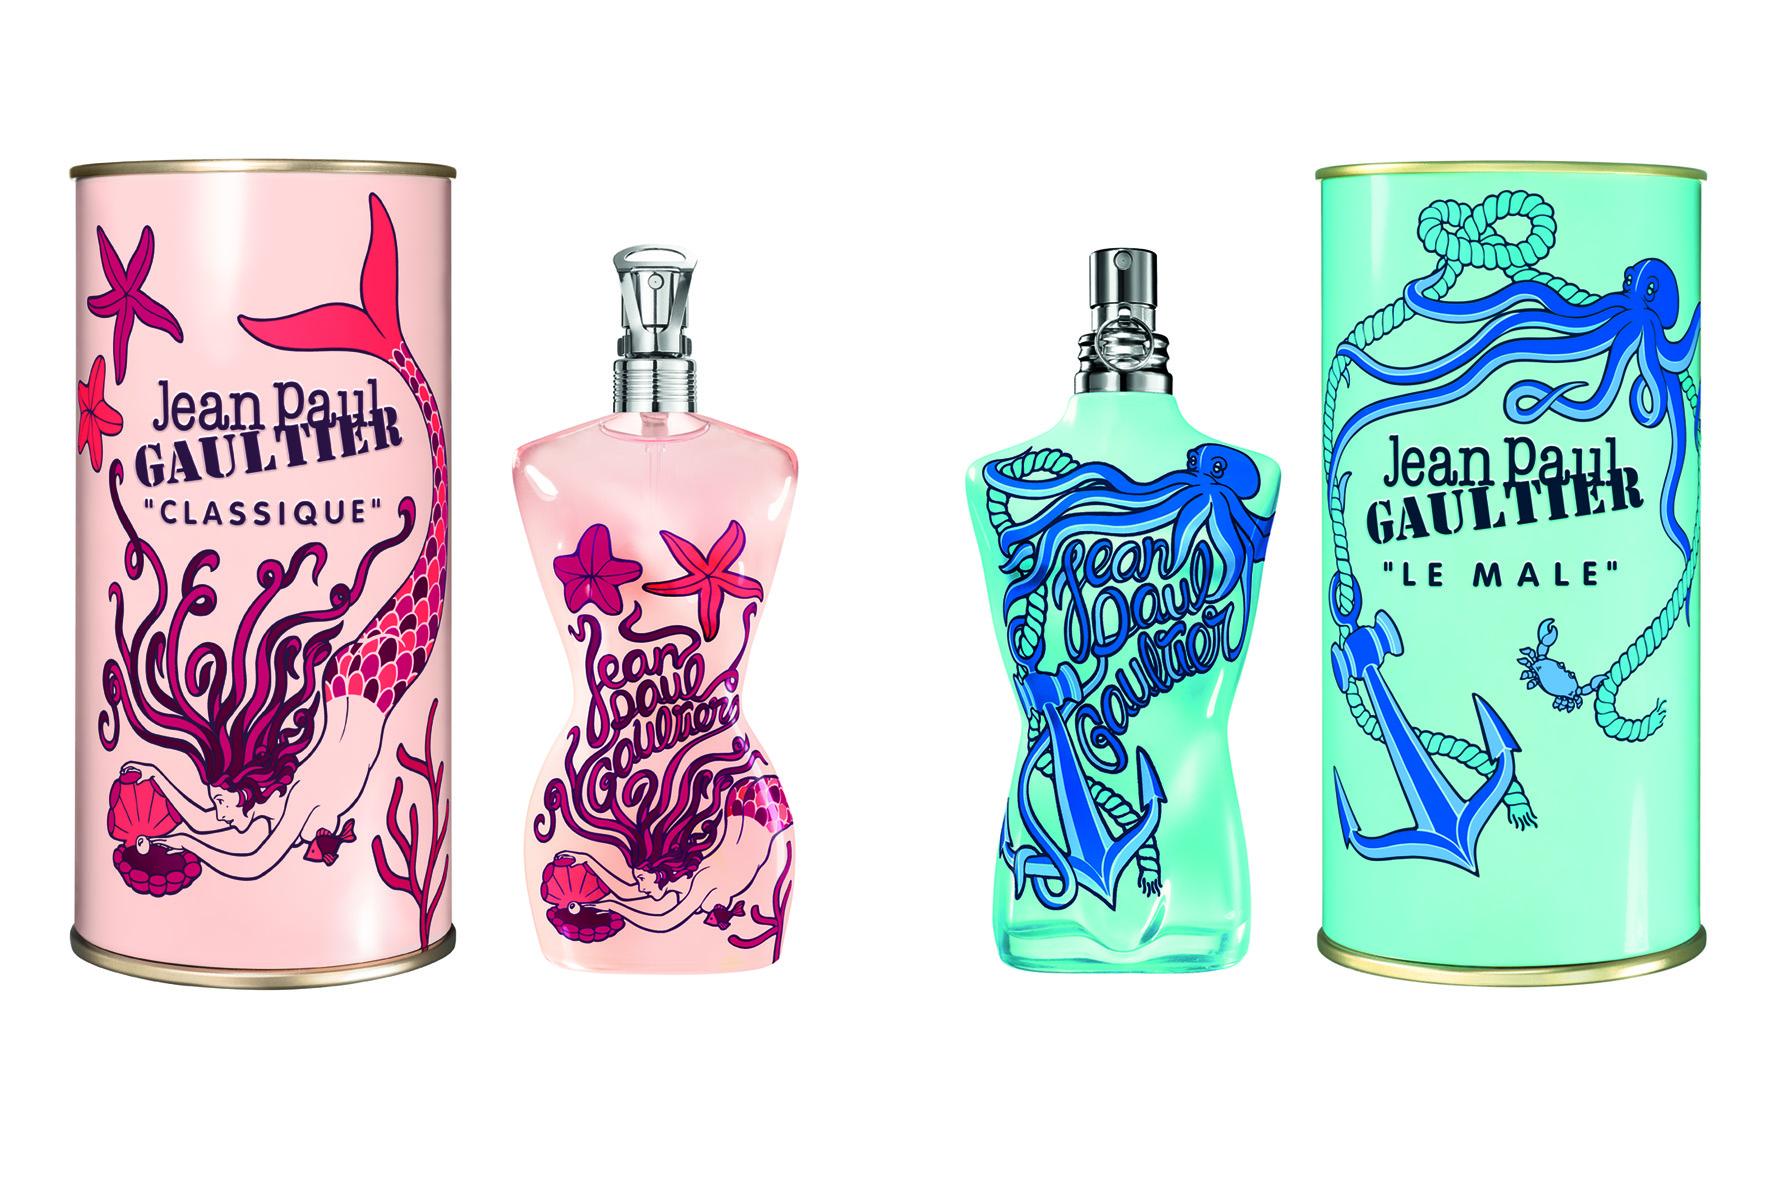 Limitee Edition Jean Gaultier Parfum Paul Femme Yfvbg6yI7m